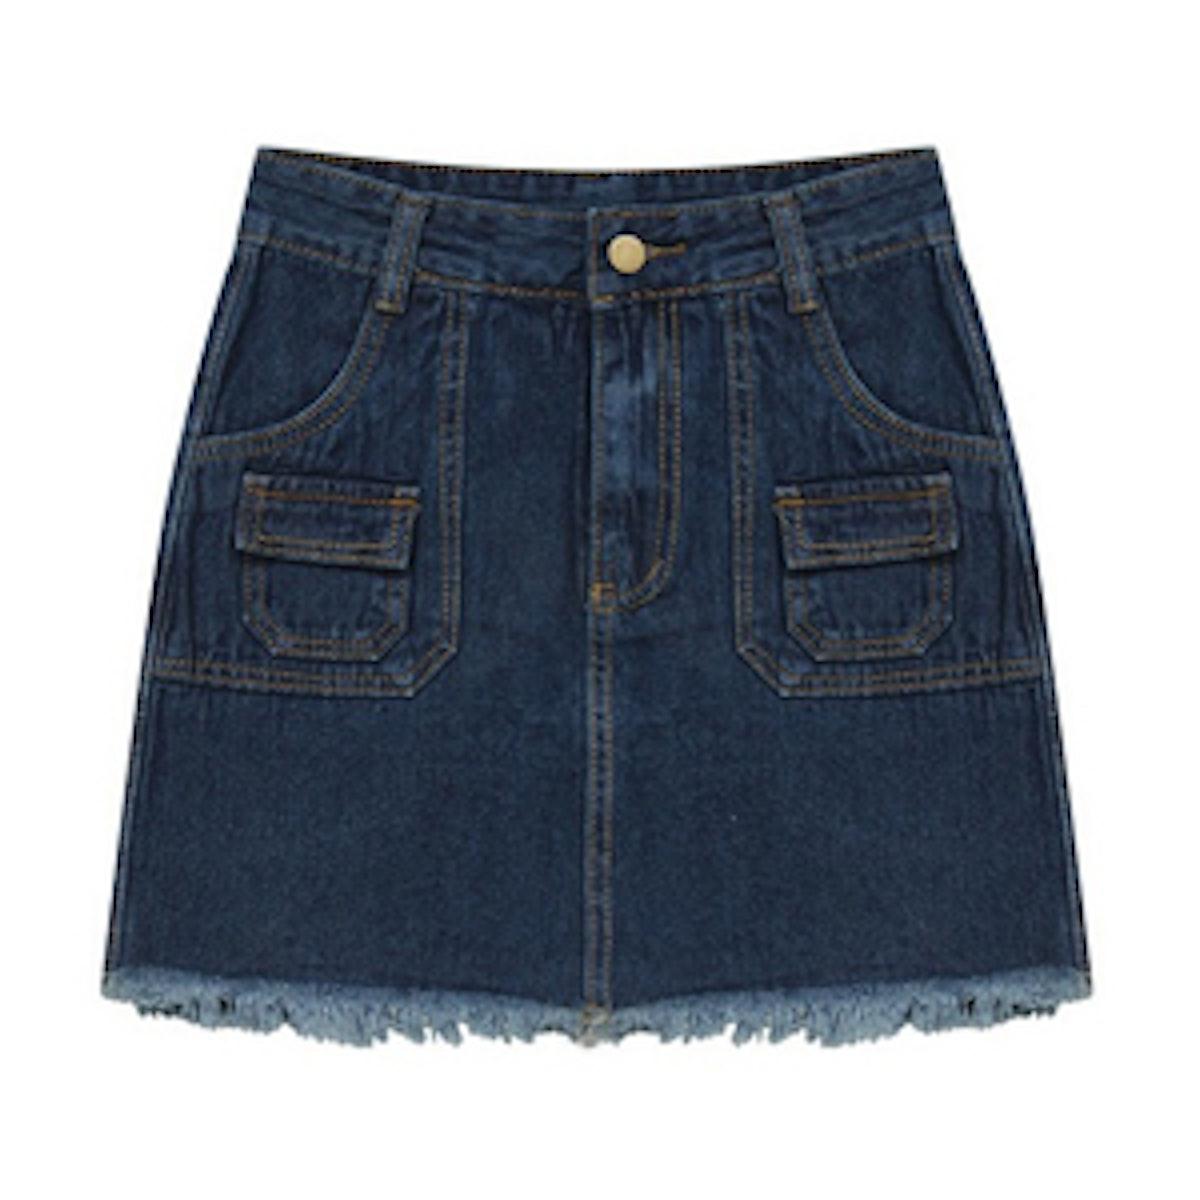 Retro Style Pencil Skirt